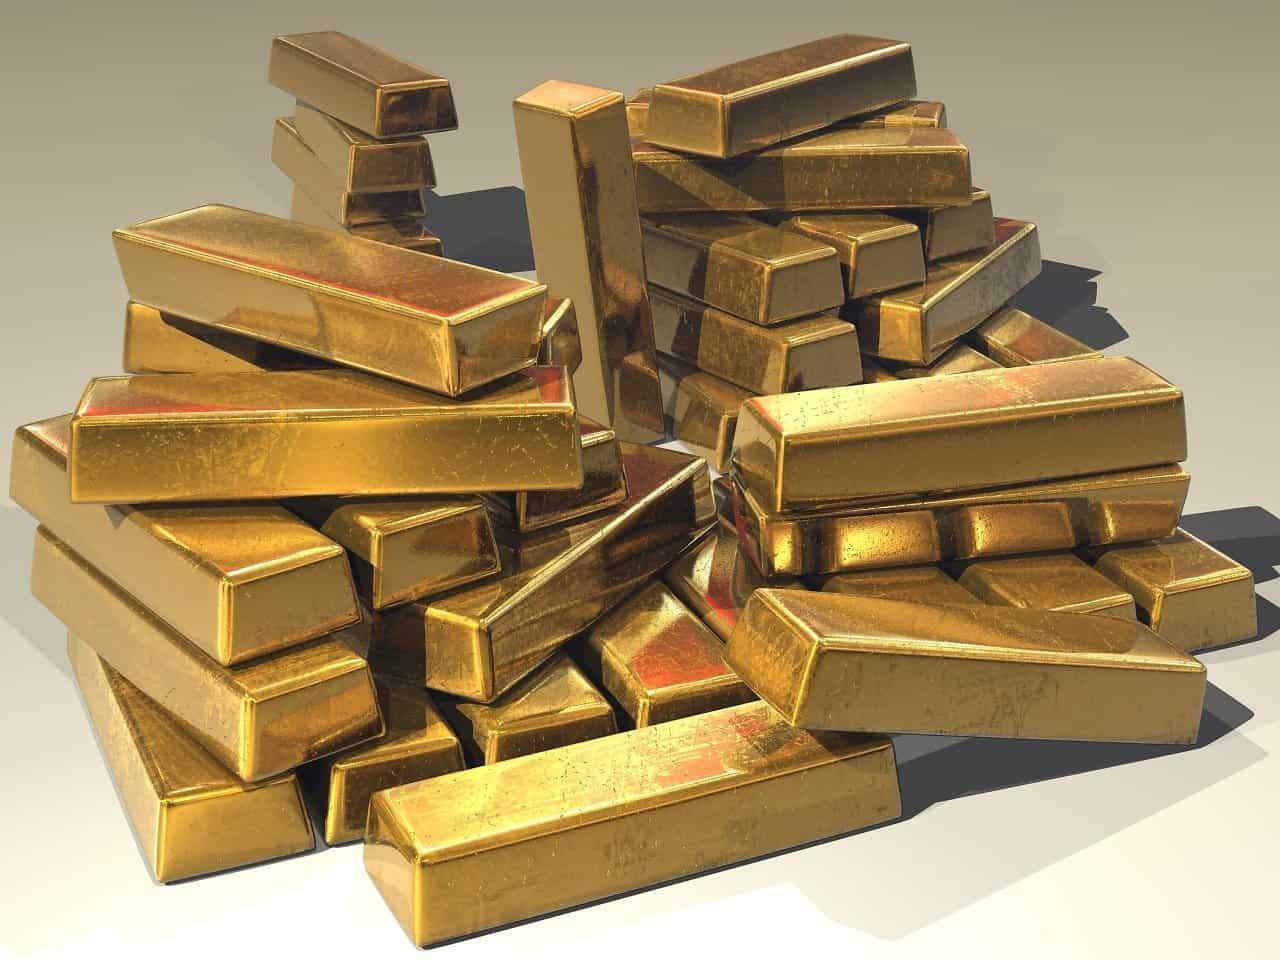 gold, ingots, treasure